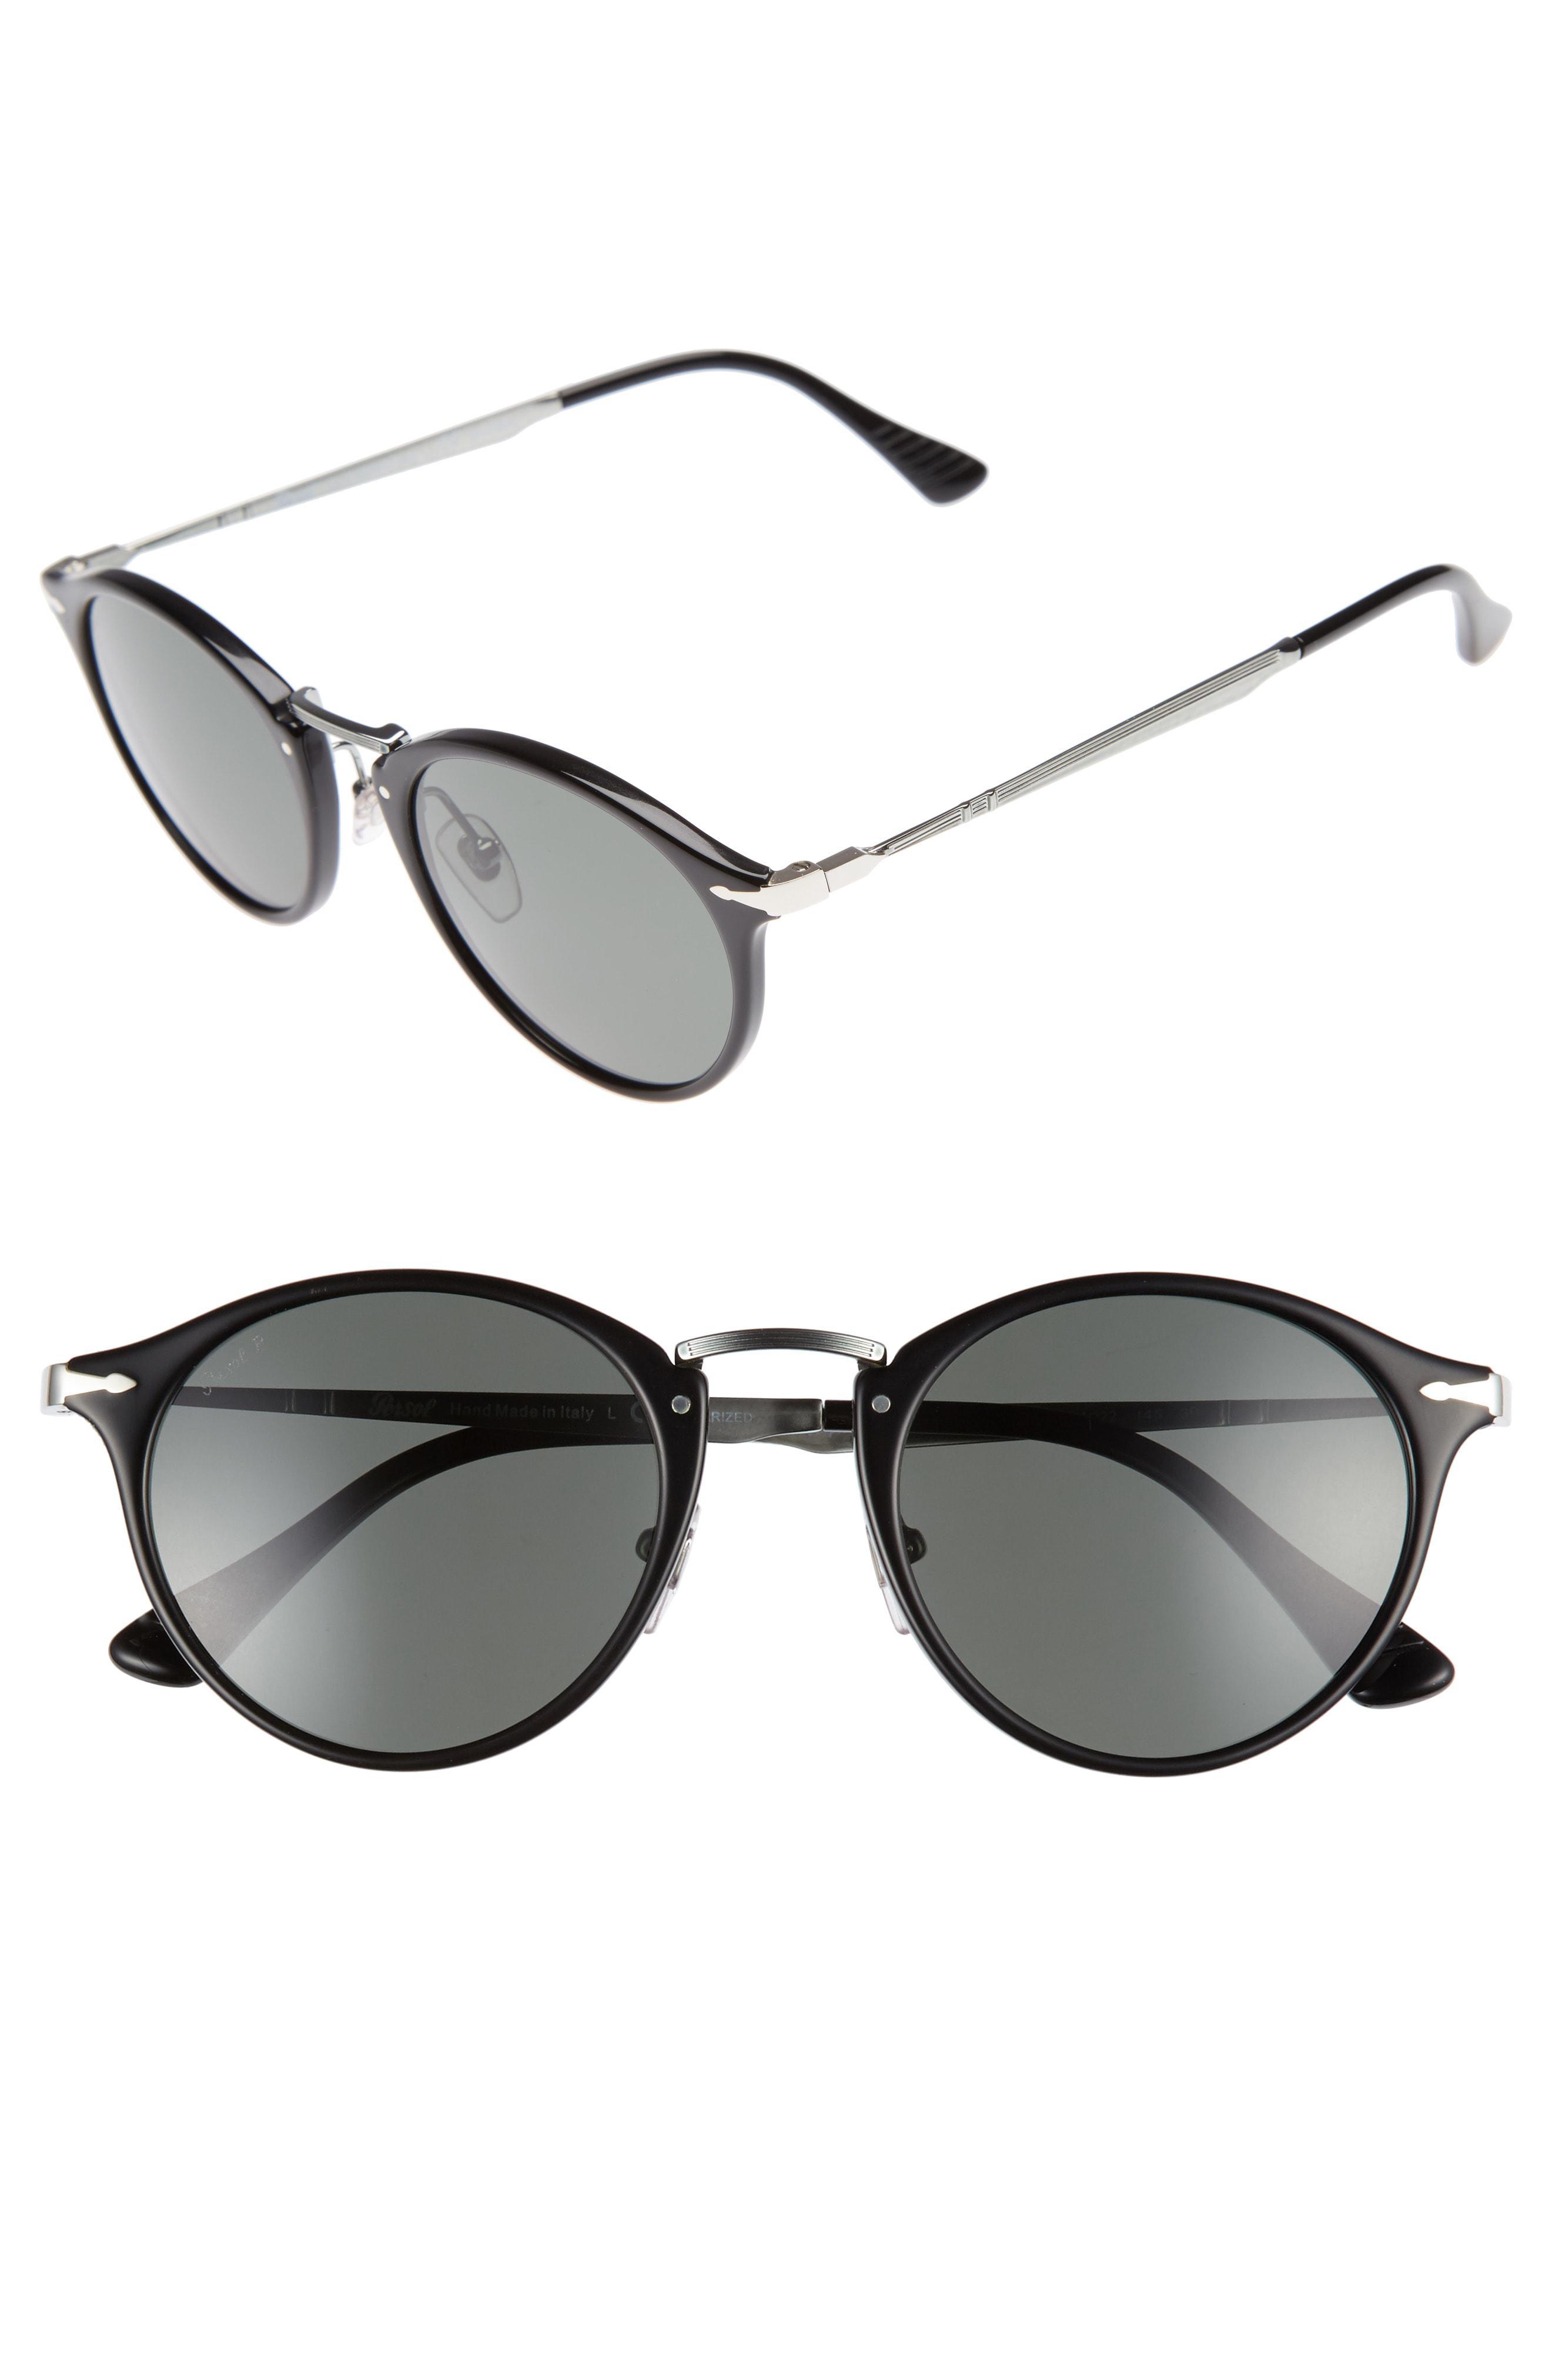 12906b16c4 Lyst - Persol Sartoria Typewriter 51mm Polarized Sunglasses - for Men